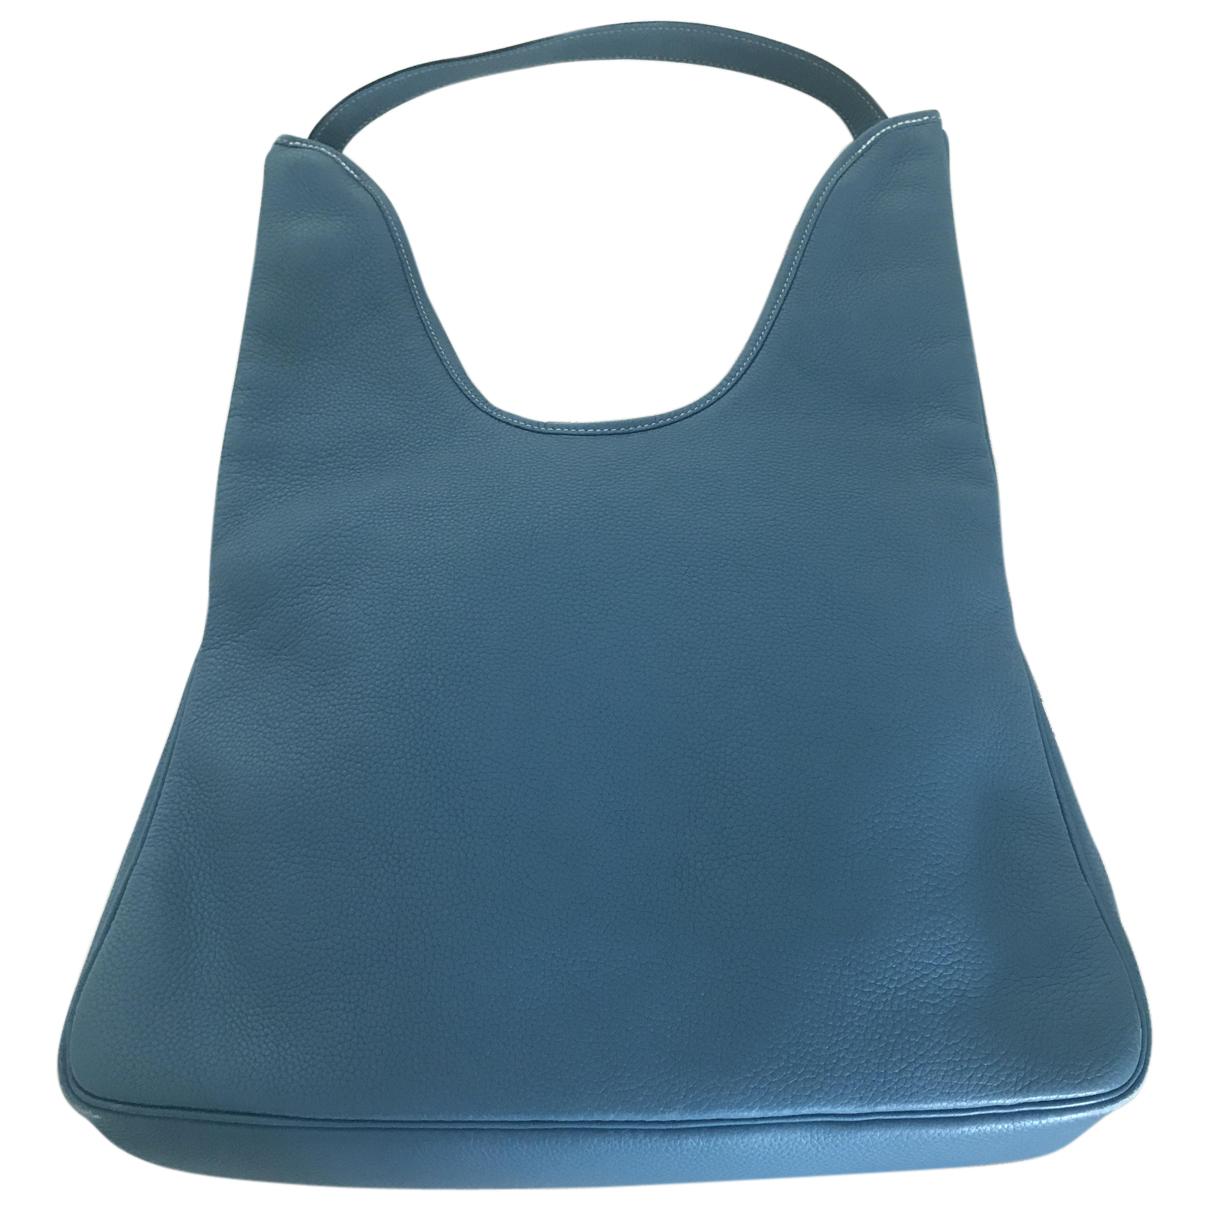 Hermes - Sac a main Massai pour femme en cuir - bleu